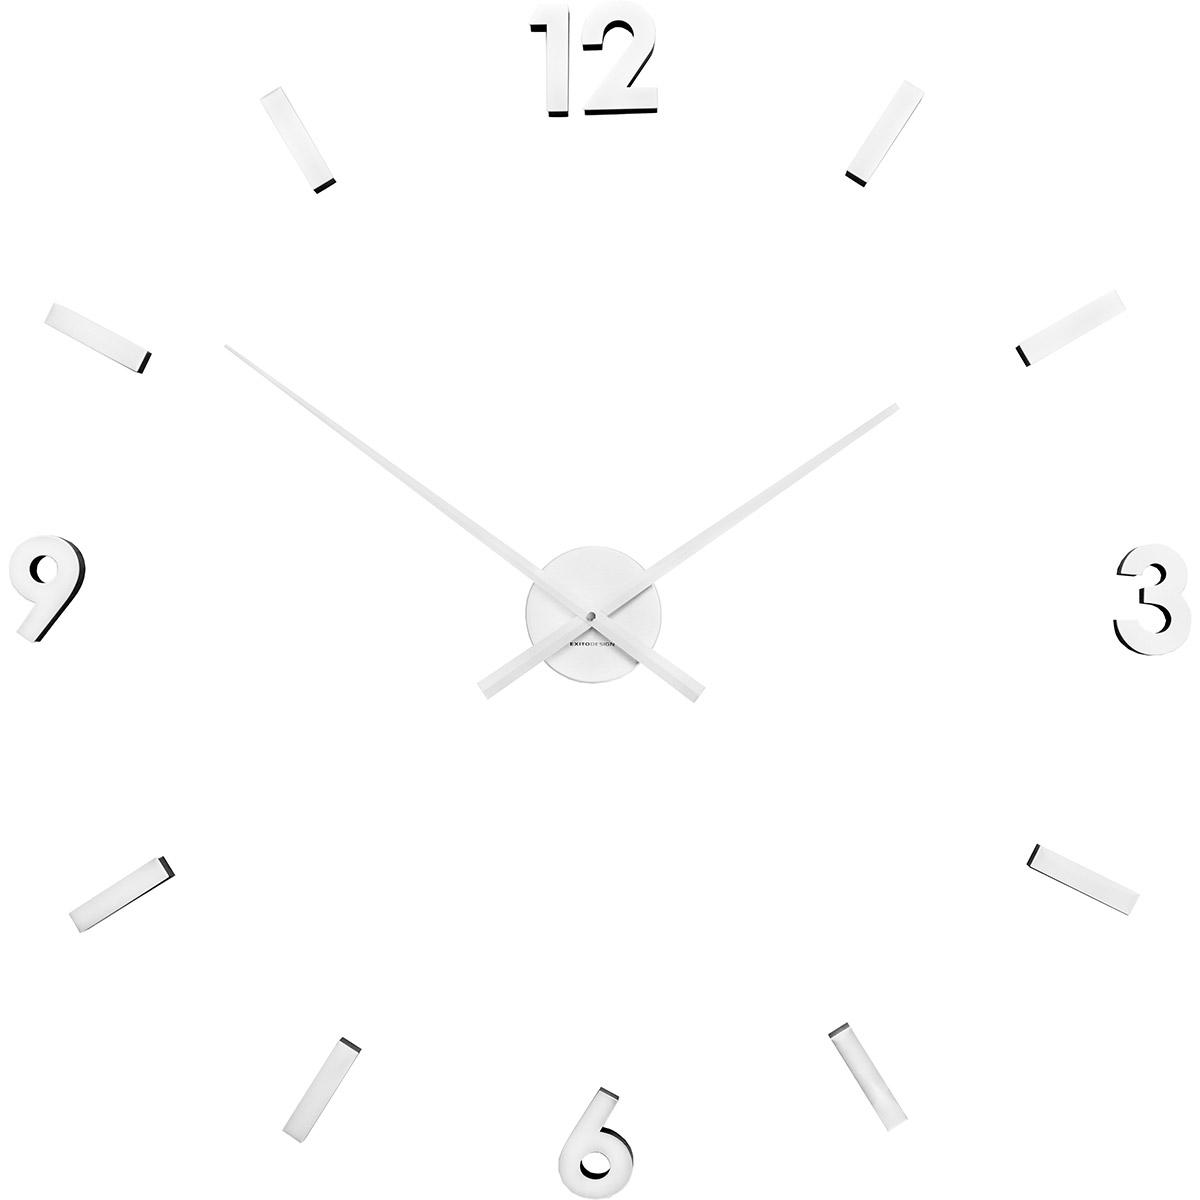 Biały Zegar Naklejany Na ścianę Extender Exitodesign